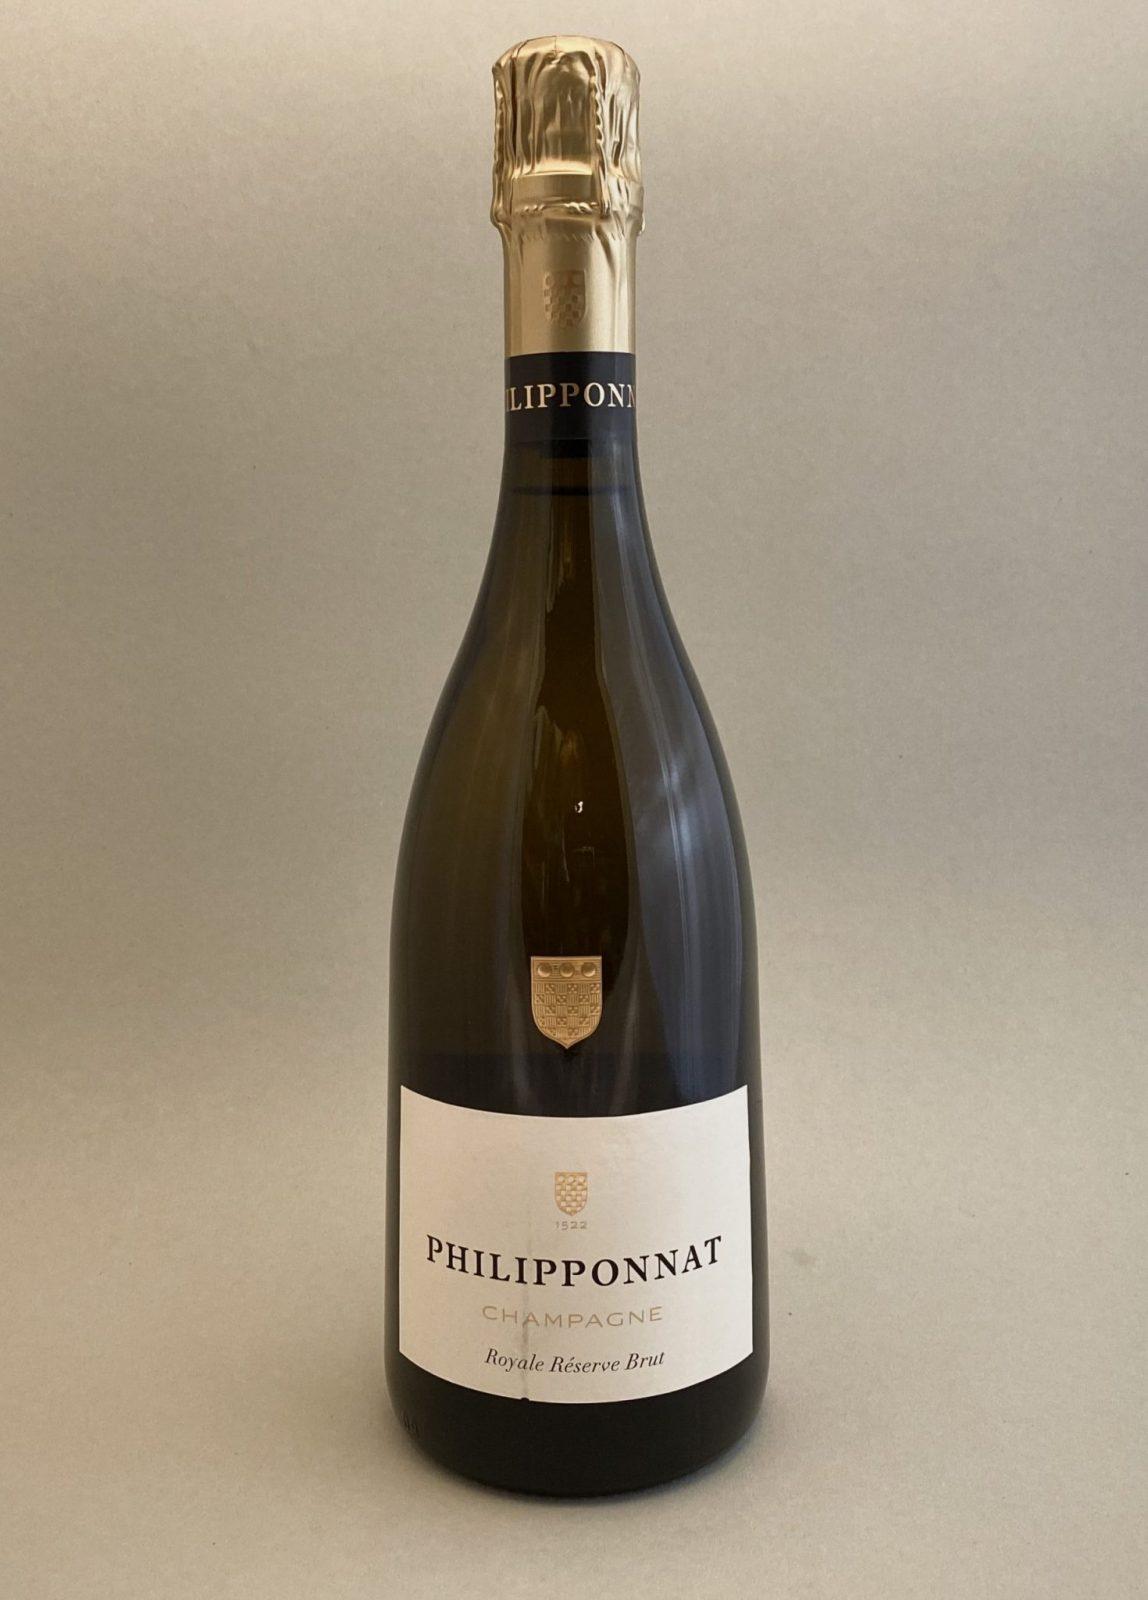 PHILIPPONNAT Royale Reserve Champagne Brut, Bulbinkove vino, vinotéka Bratislava Slnecnice, Sunnywines, rozvoz vina, winebar